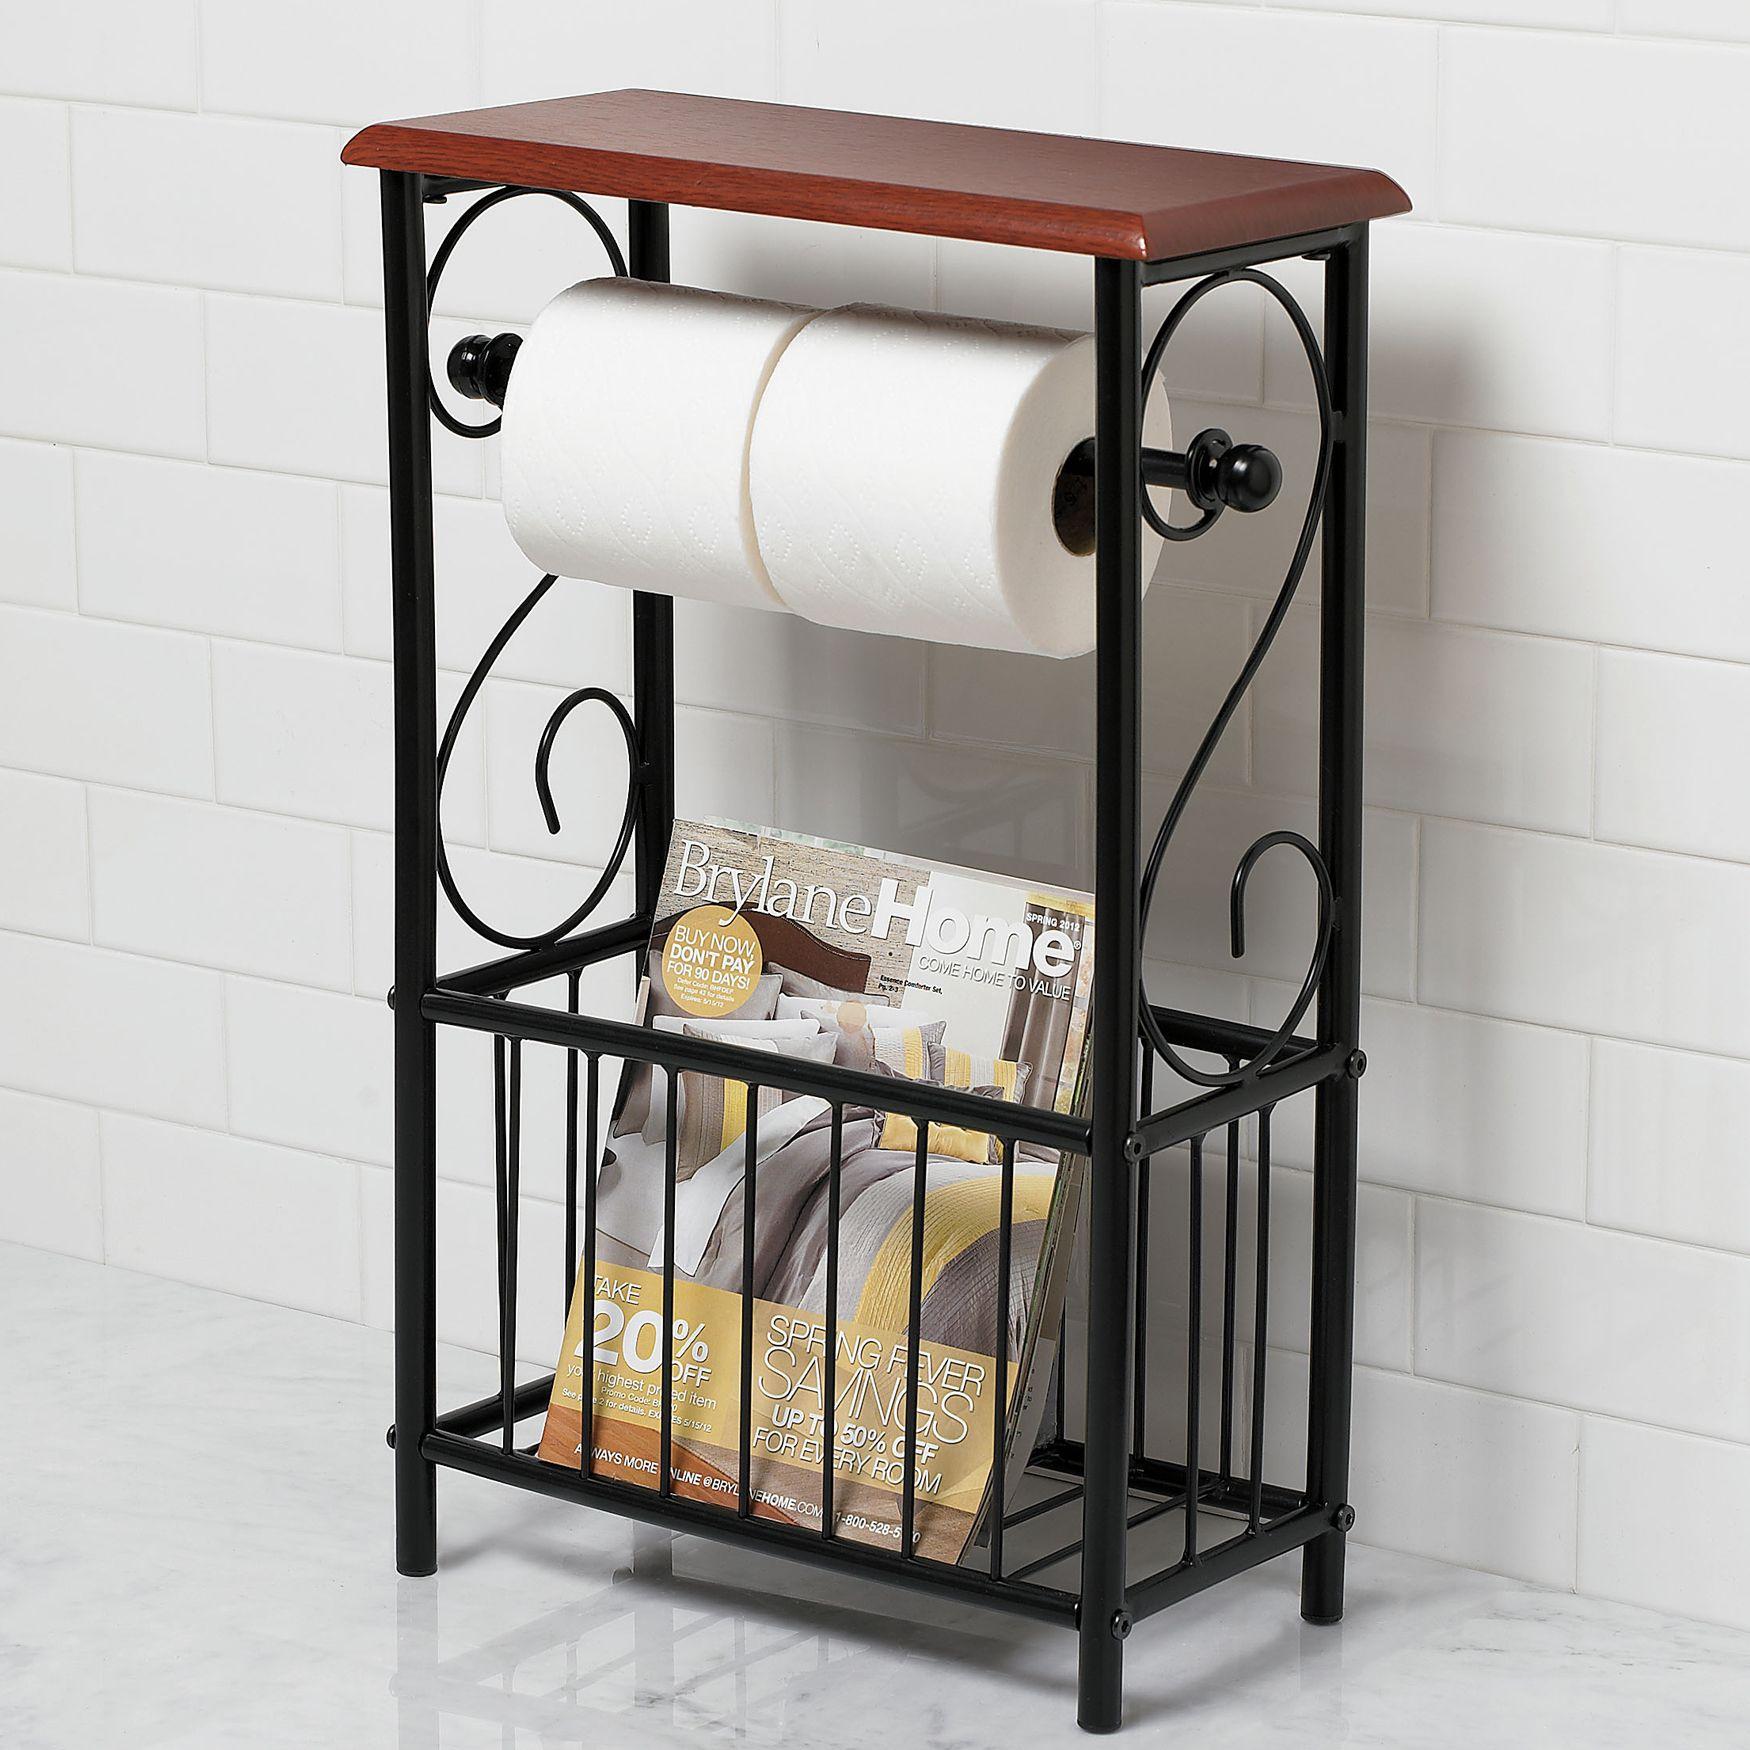 Scroll Toilet Paper Magazine Holder Toilet Paper Holder Toilet Paper Bathroom Table